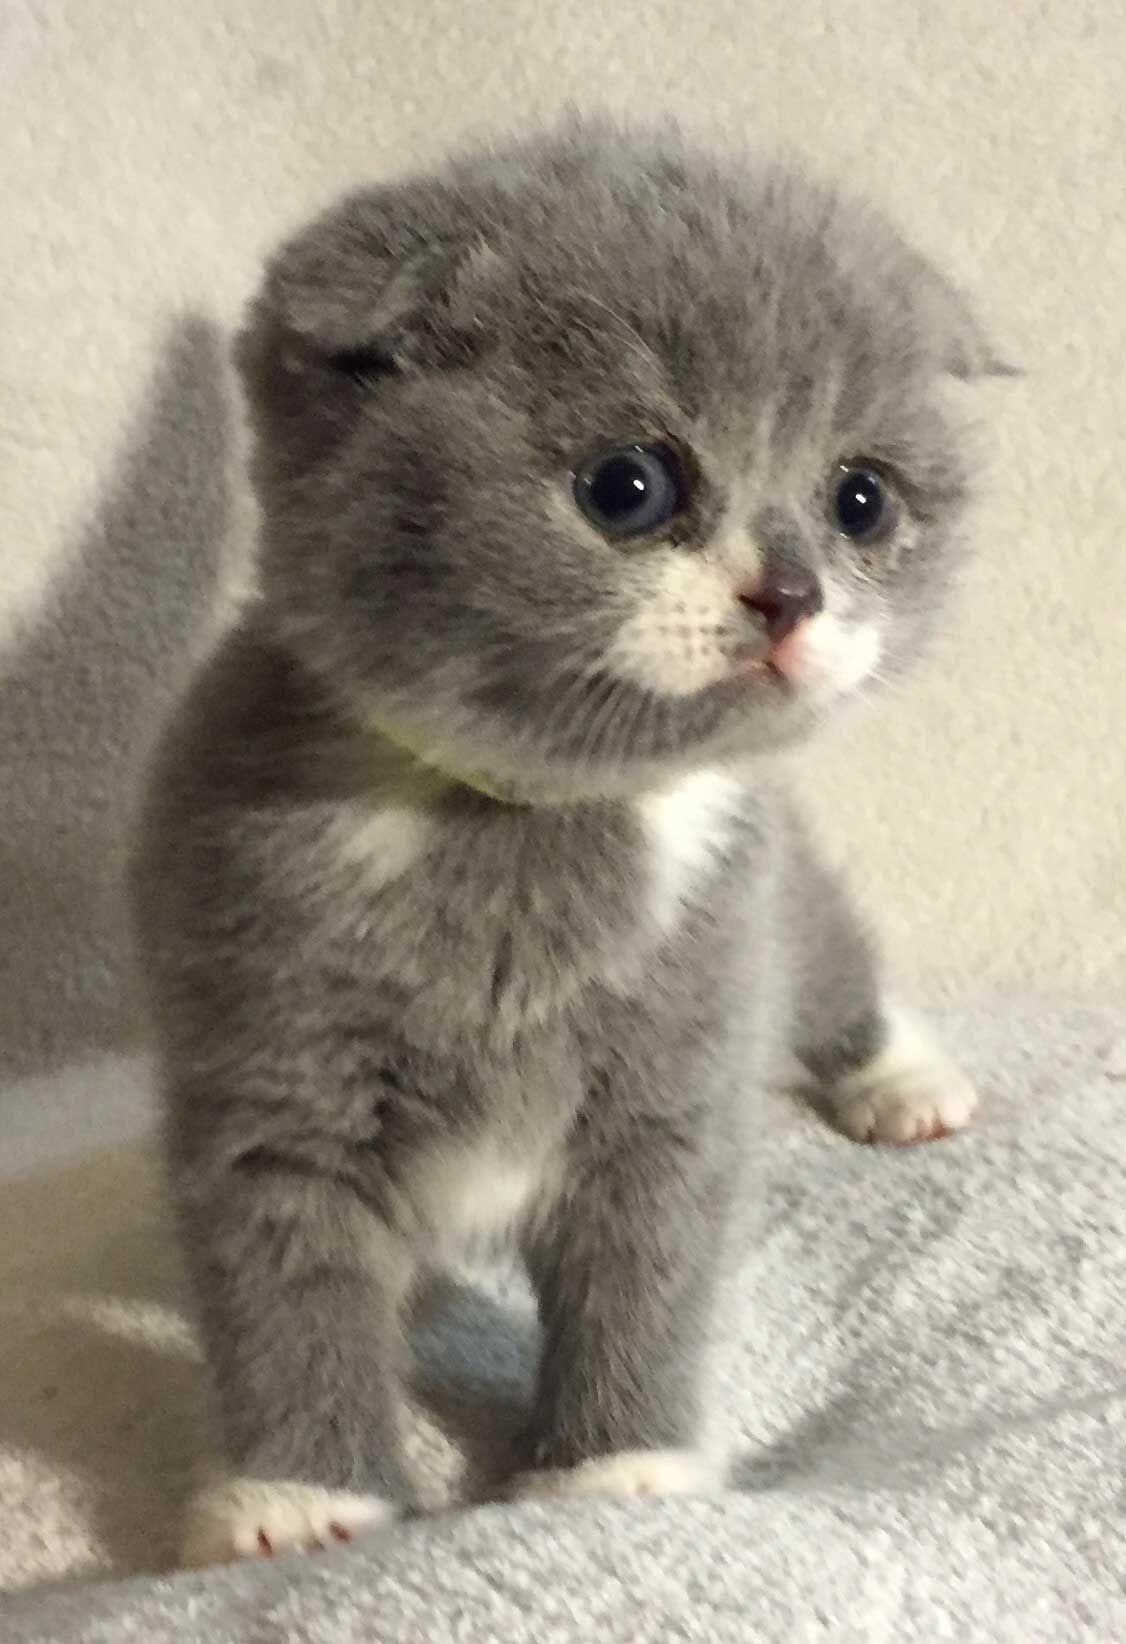 Scottish Fold Kittens For Sale Munchkinkittens Munchkin Cat Munchkin Kitten Scottish Fold Kittens